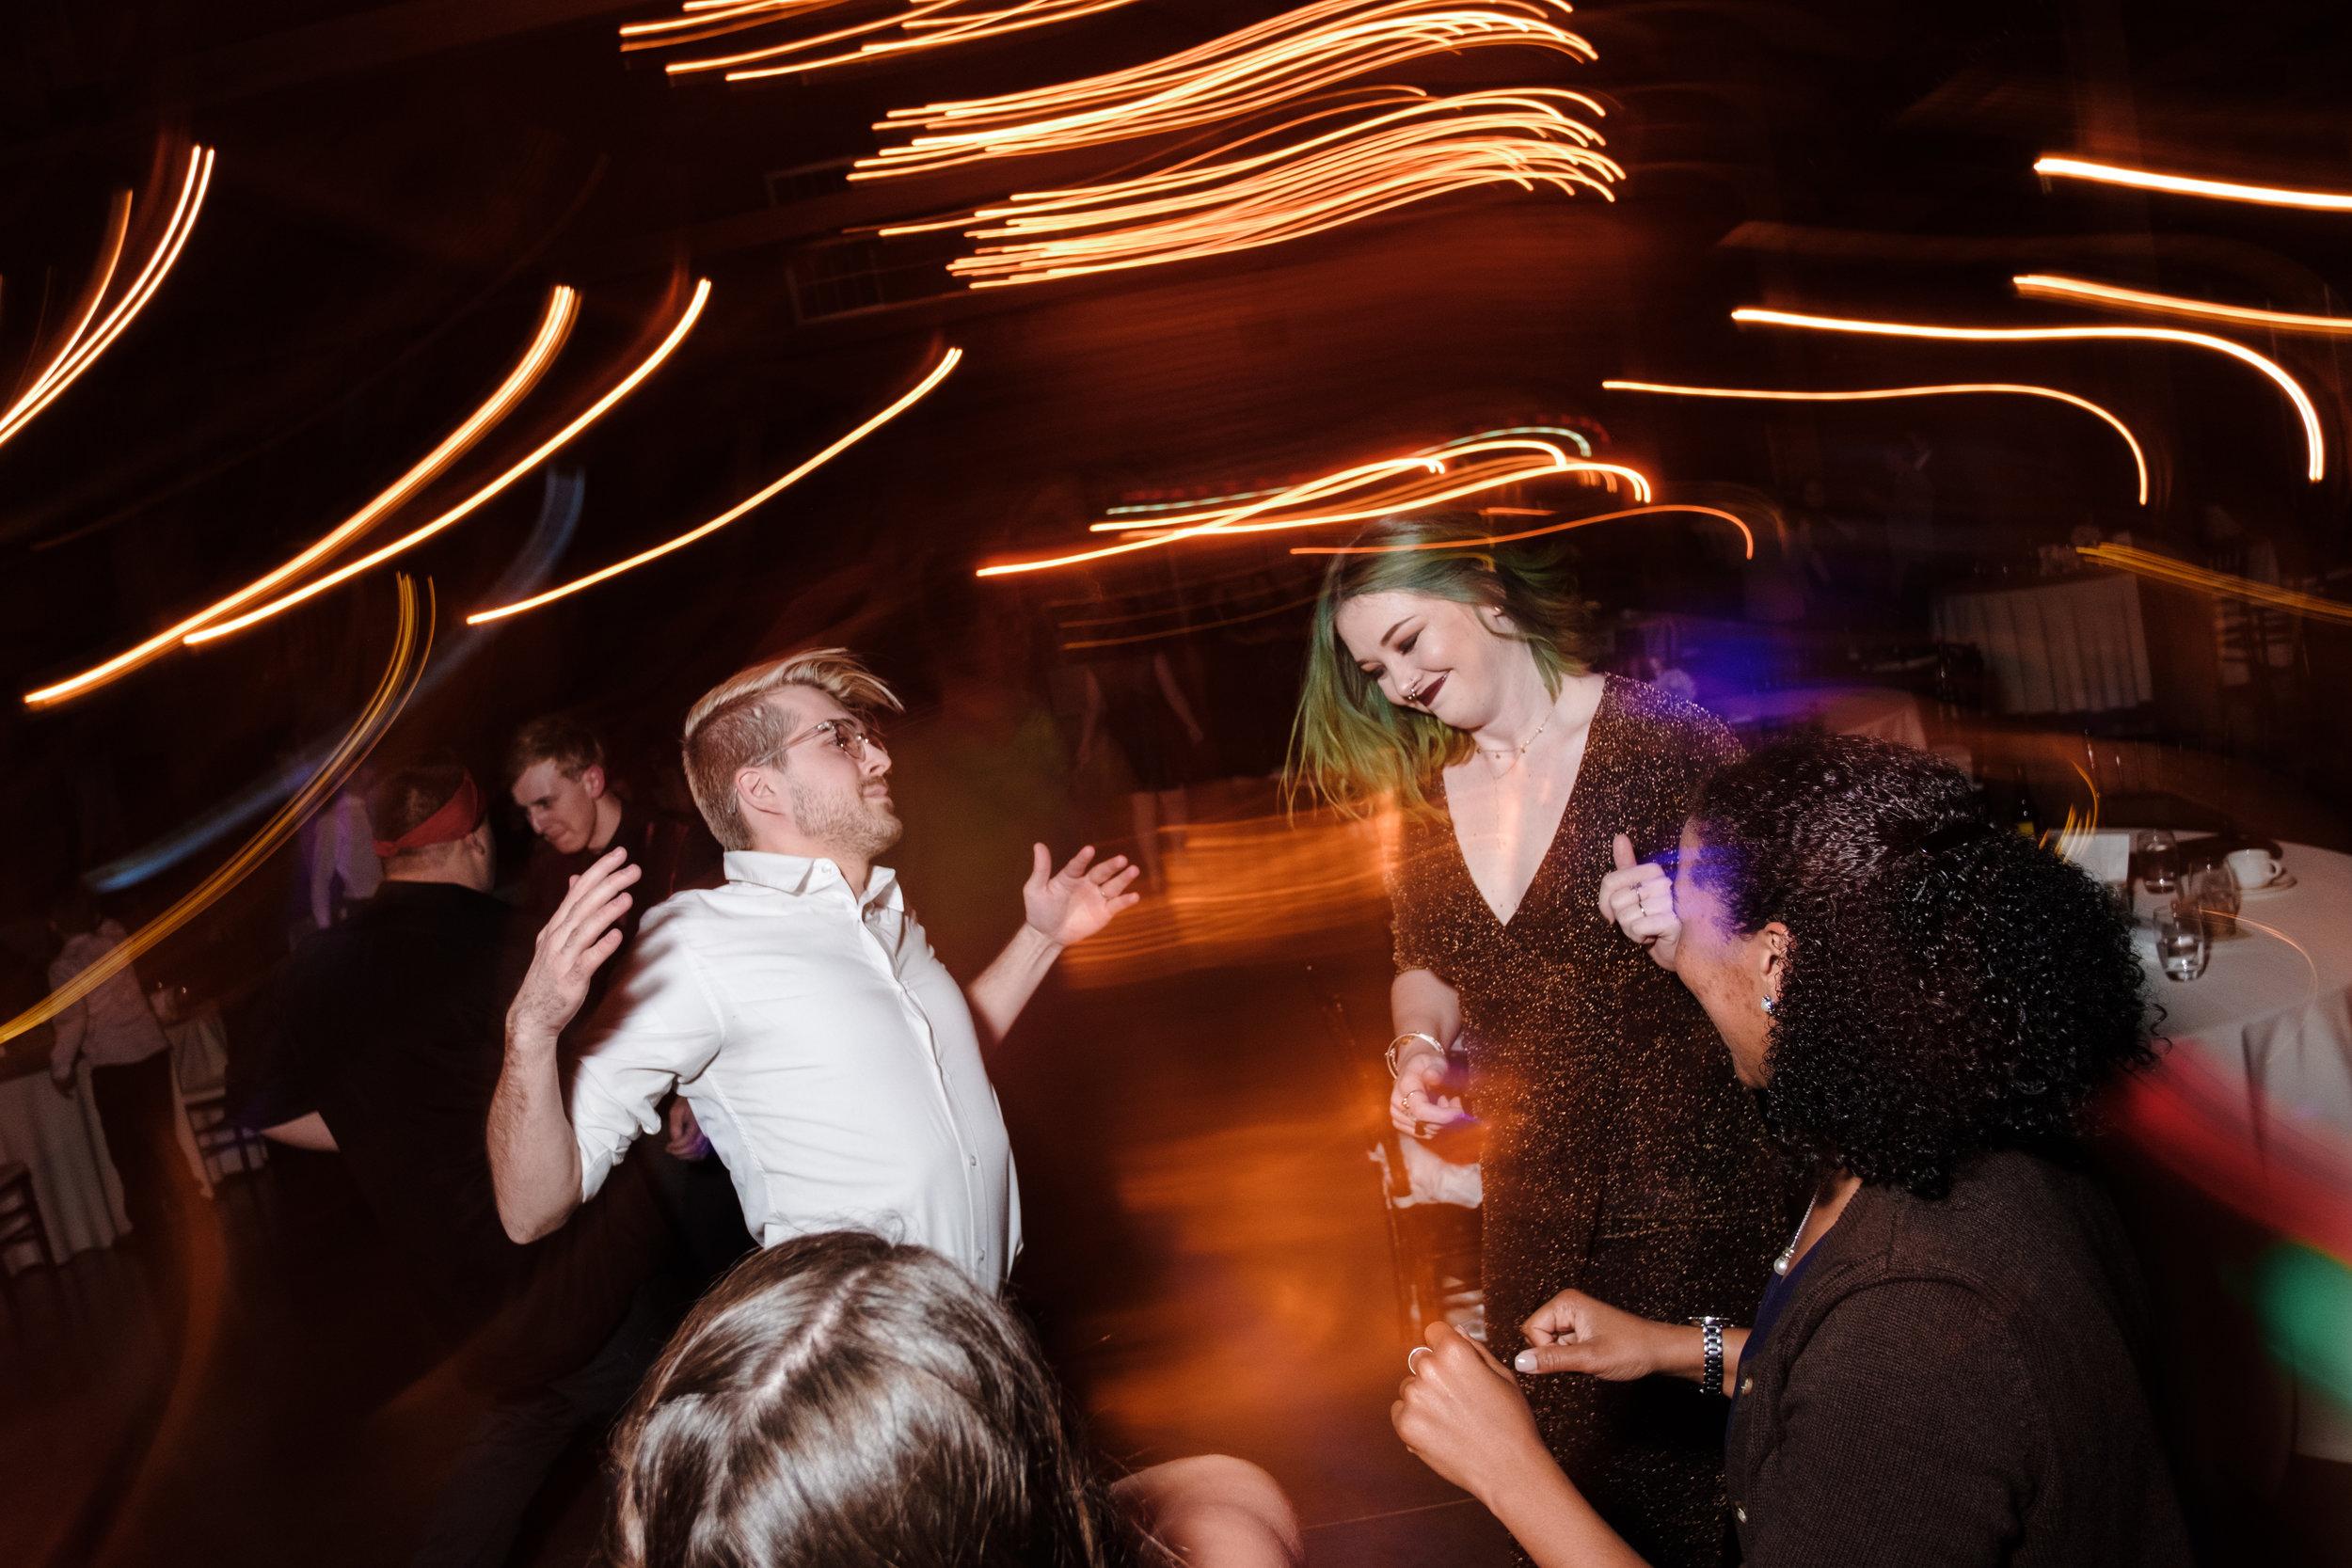 18-12-28 Corinne-Henry-Pavilion-Wedding-654.jpg